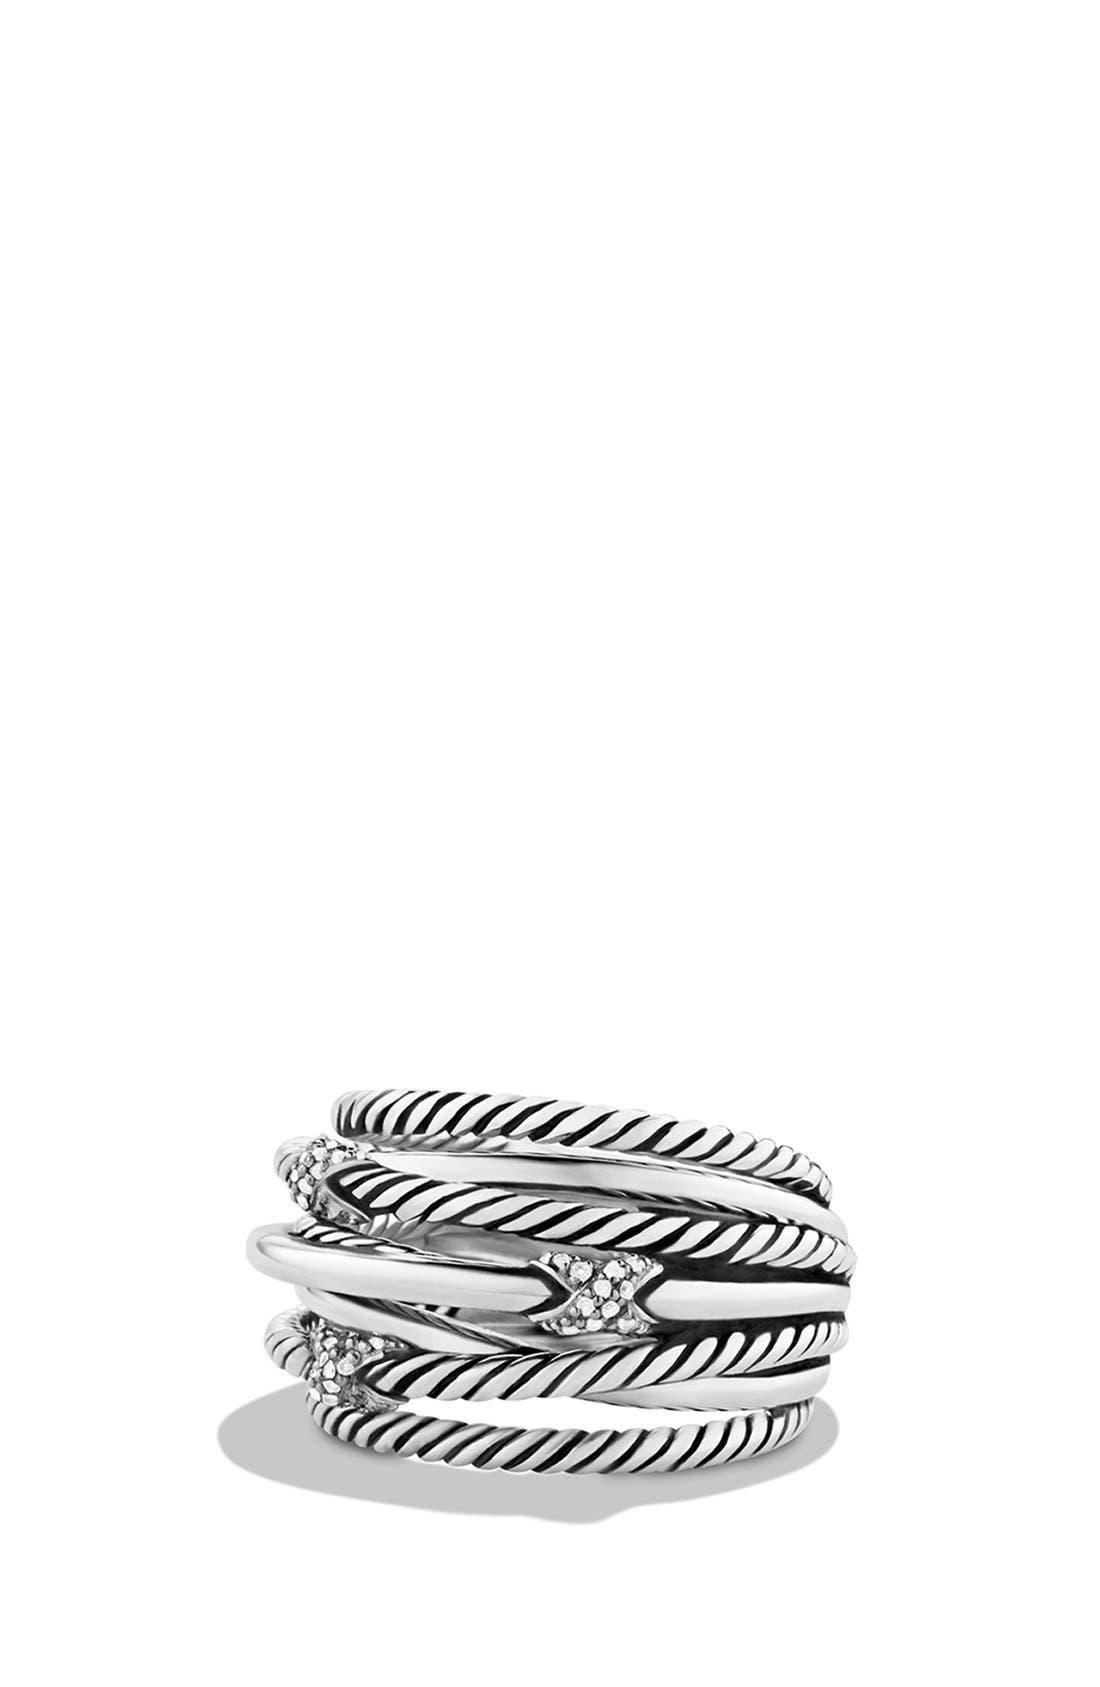 Main Image - David Yurman 'Three X Crossover' Ring with Diamonds